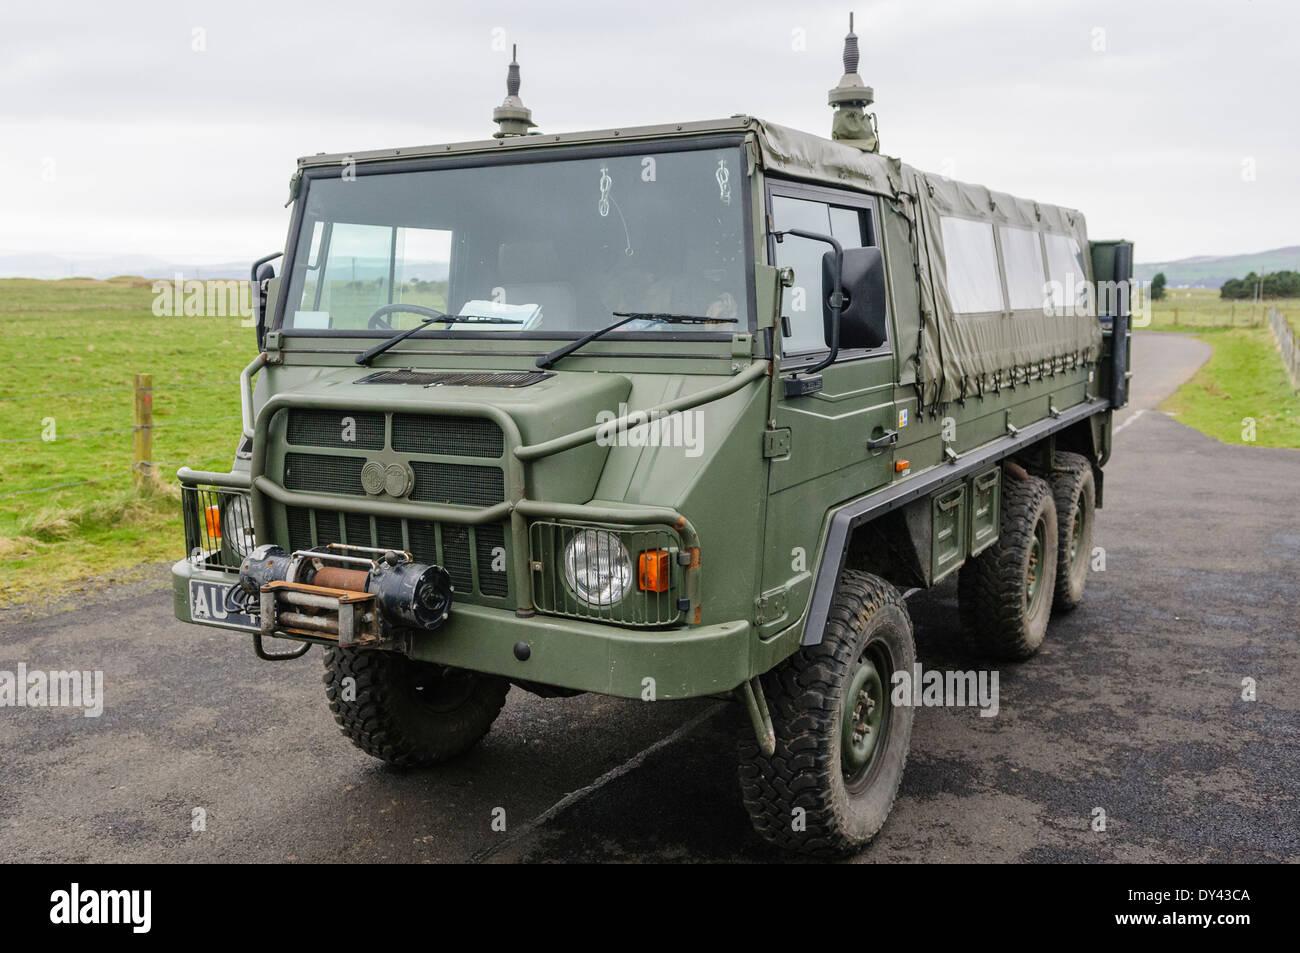 Pinzgauer 6x6 all wheel drive military vehicle - Stock Image